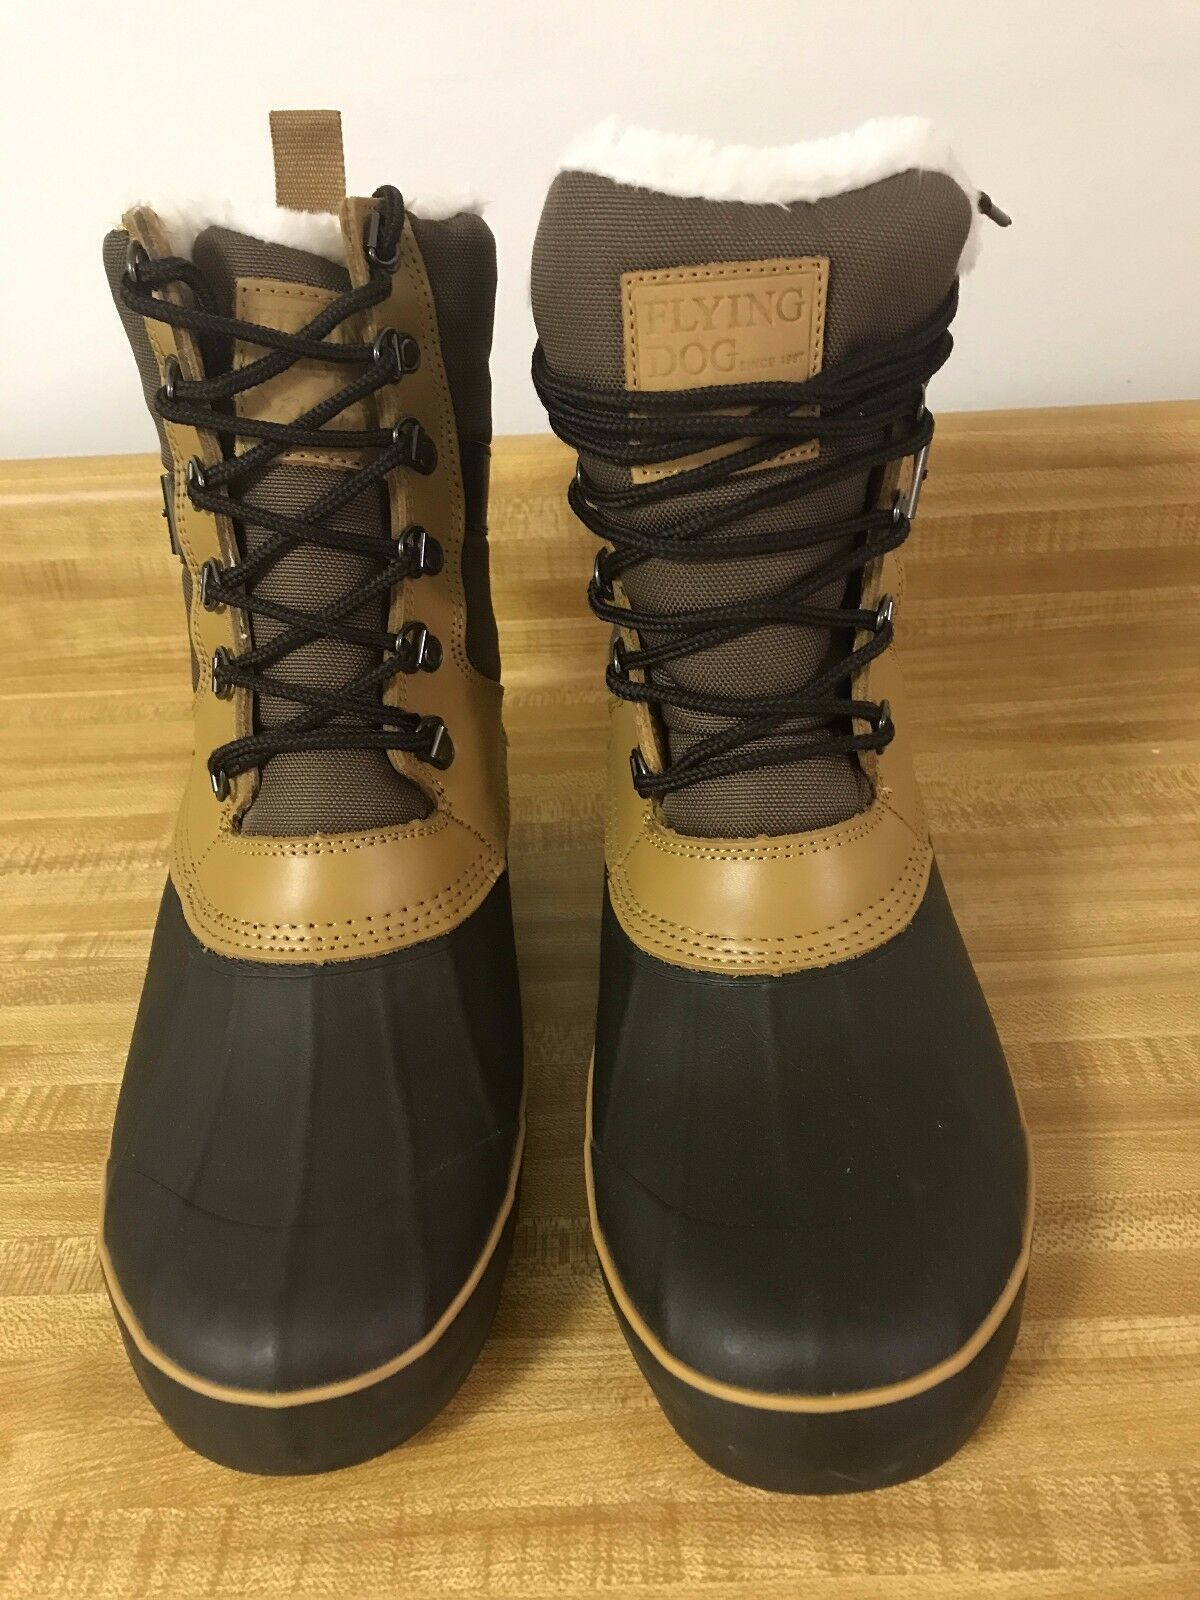 Flying Dog Fjord Duck Boots Choco/Tan - Sz 10M - NWT